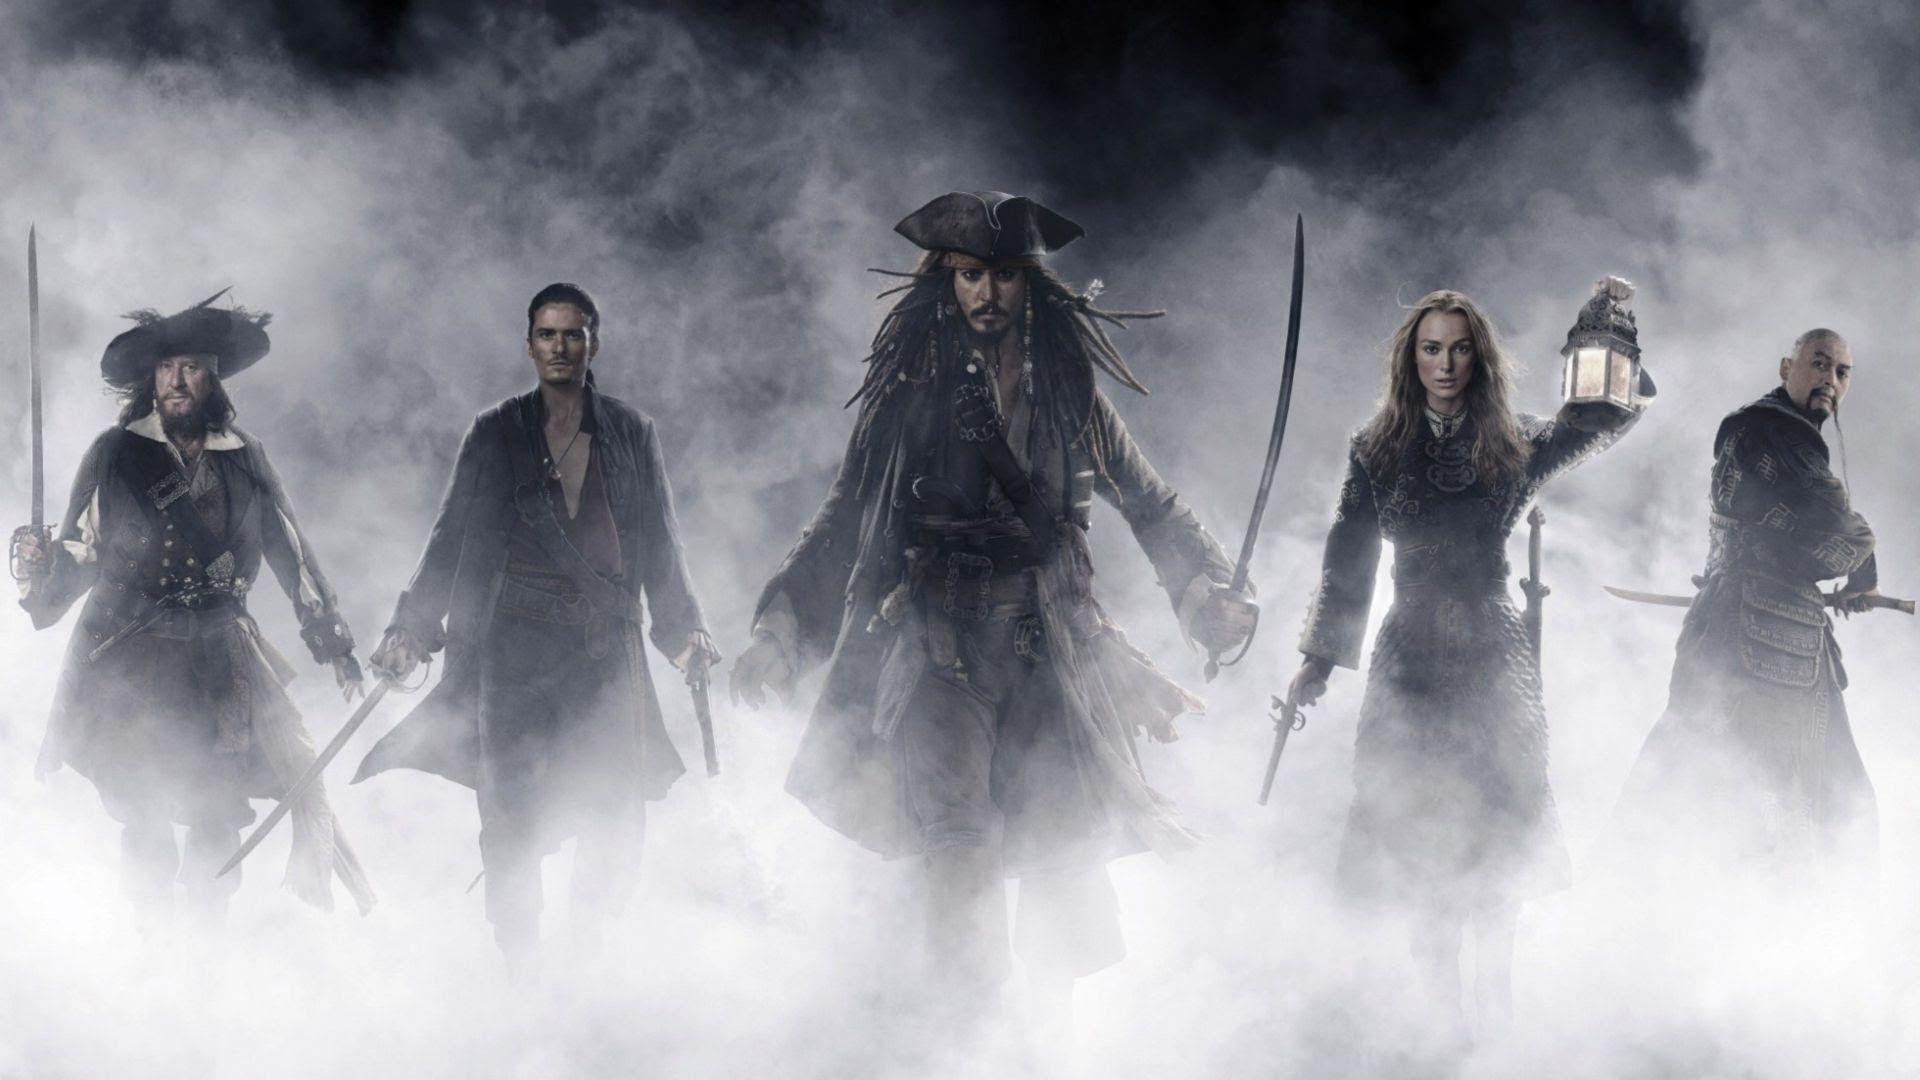 Piratas Del Caribe Incidental Piratas Del Caribe Piratas Del Caribe 3 Piratas